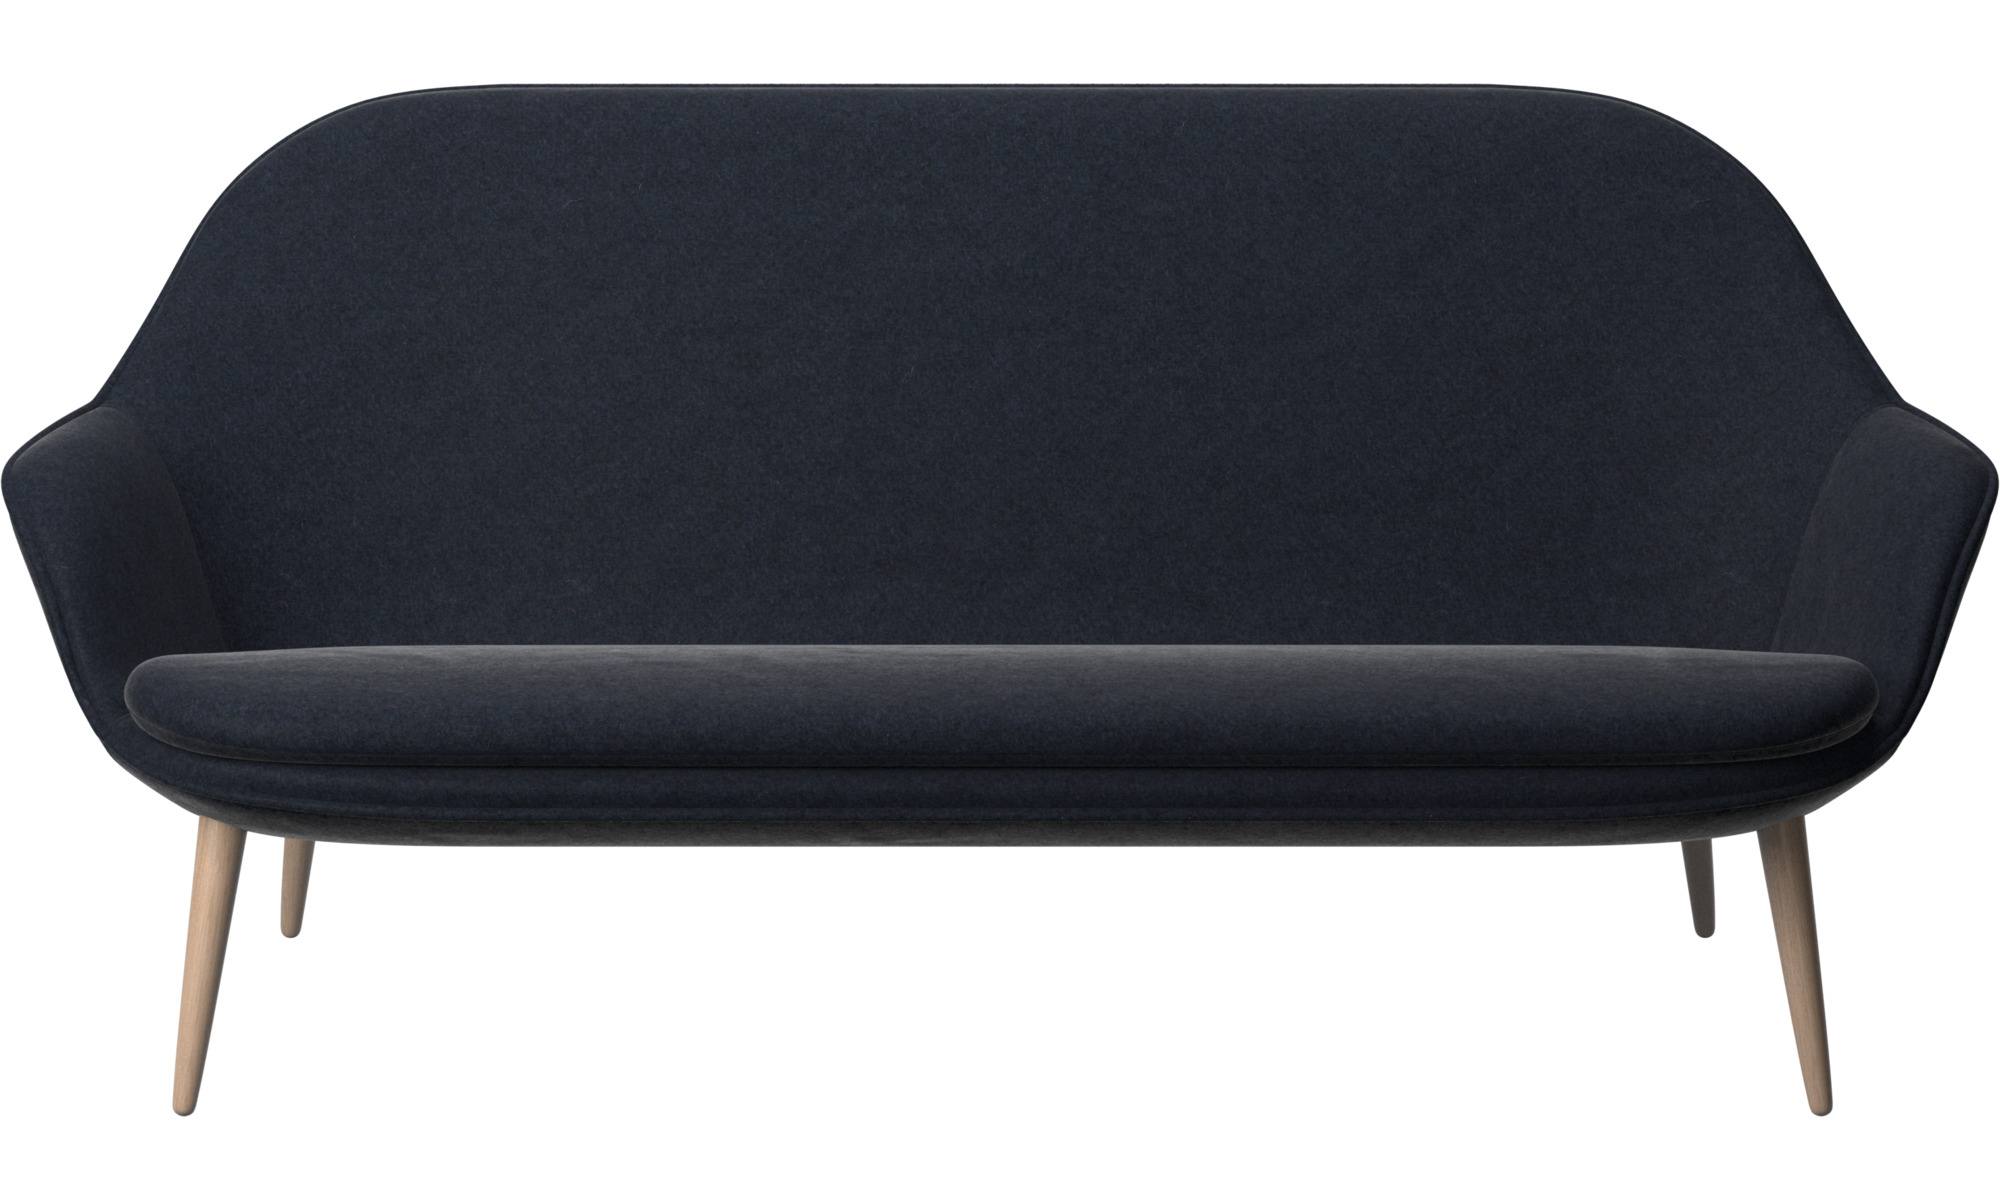 2 istuttavat sohvat adelaide sohva boconcept. Black Bedroom Furniture Sets. Home Design Ideas